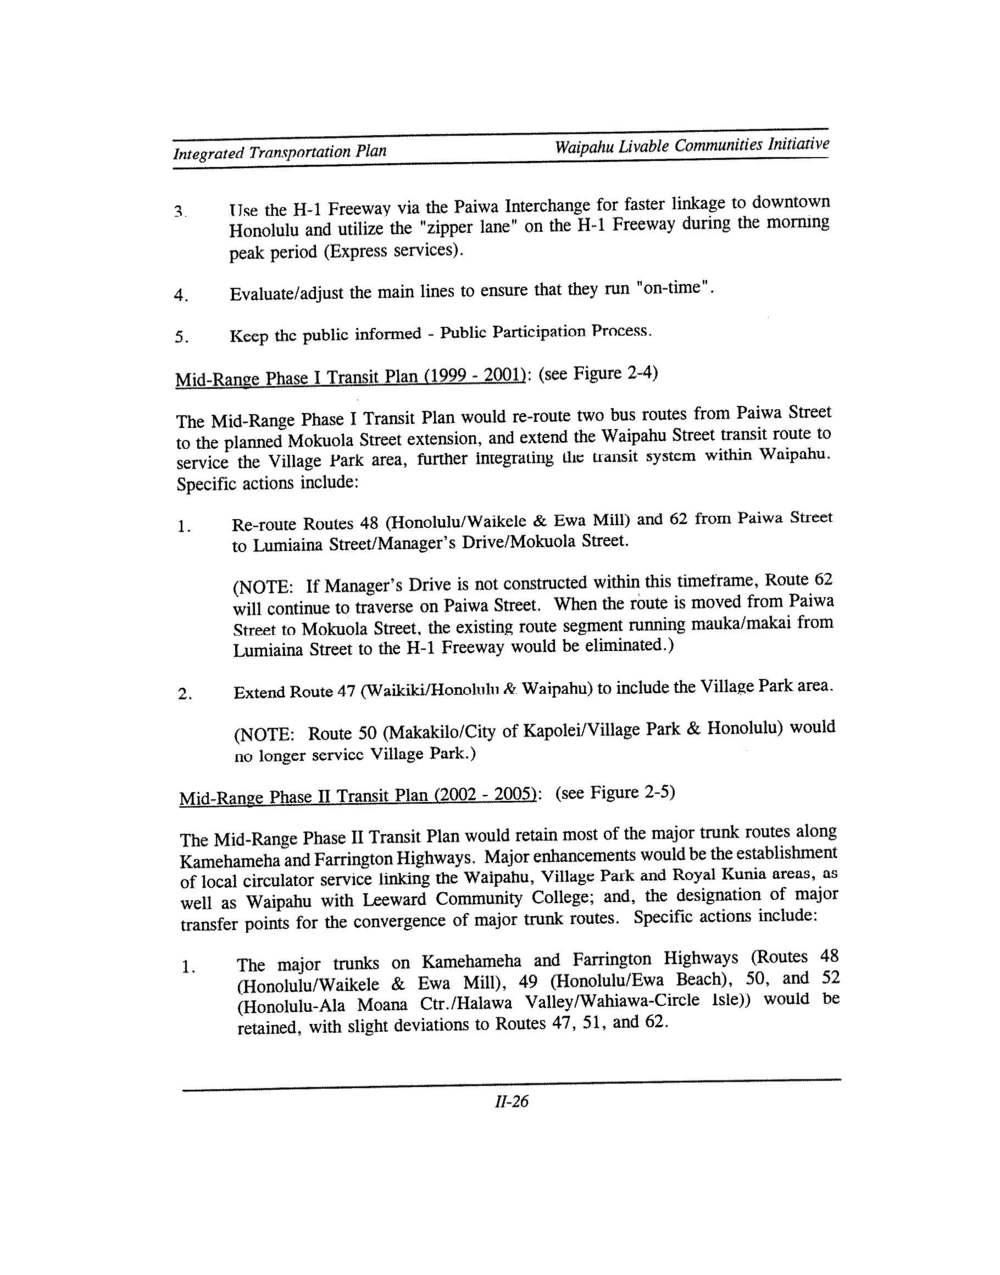 160531_WaipahuLivableCommunities(1998)_Page_041.jpg